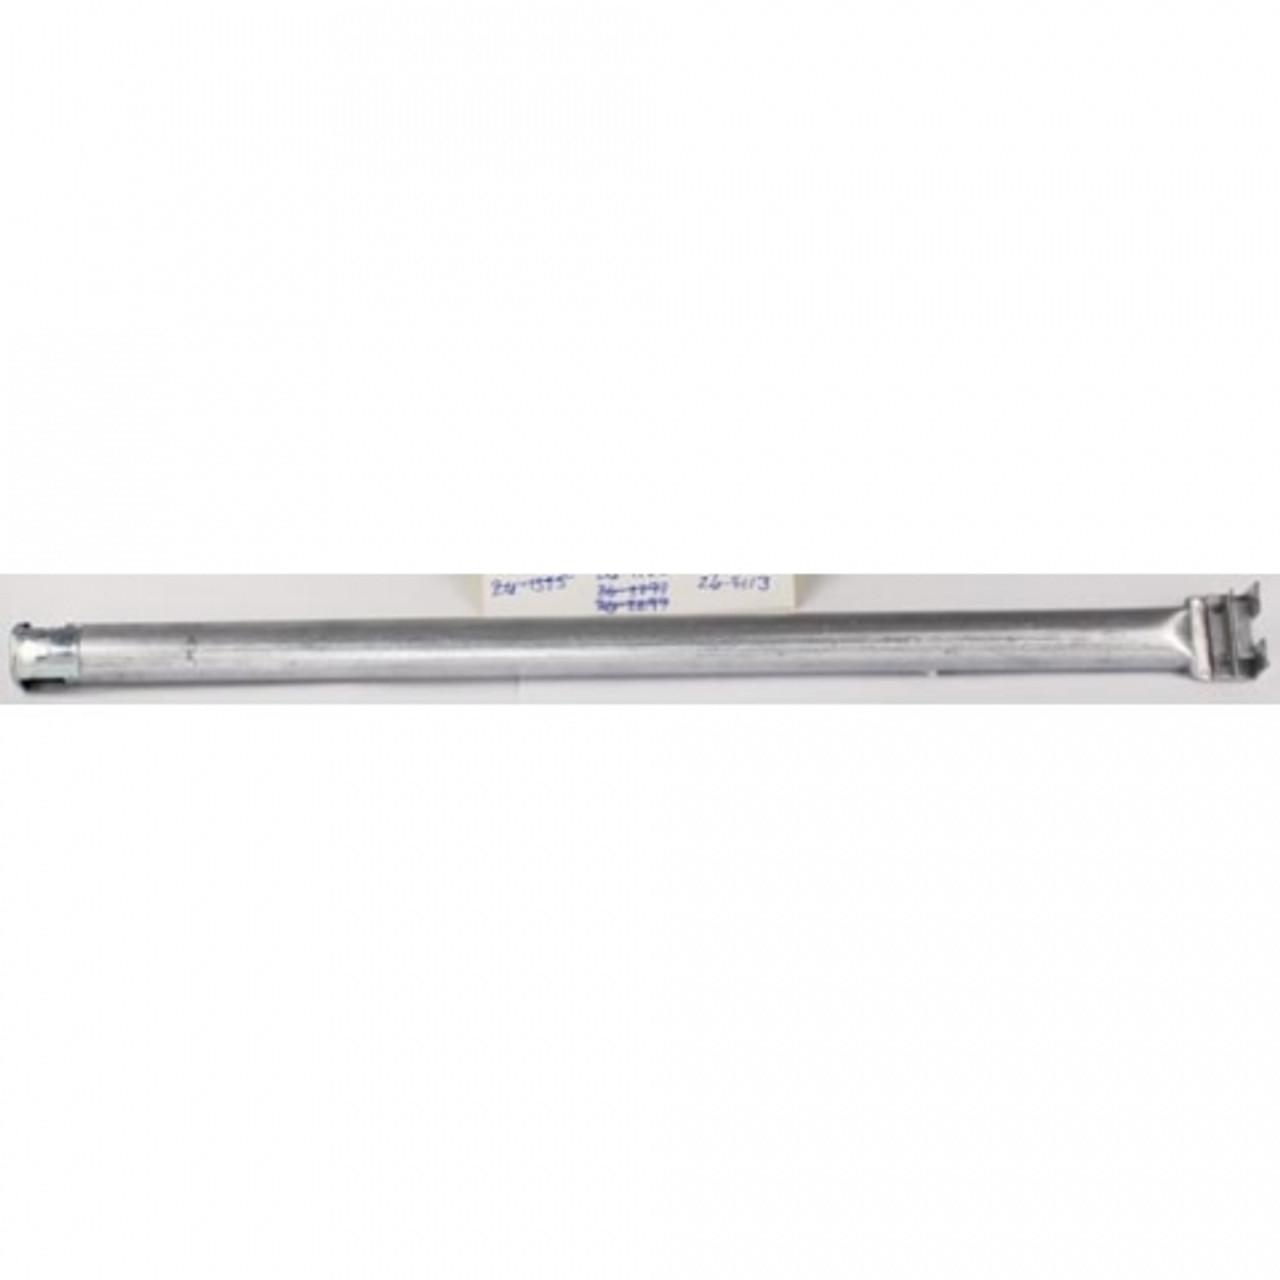 Garland - Burner 20-3/4 Steel - 222078-1